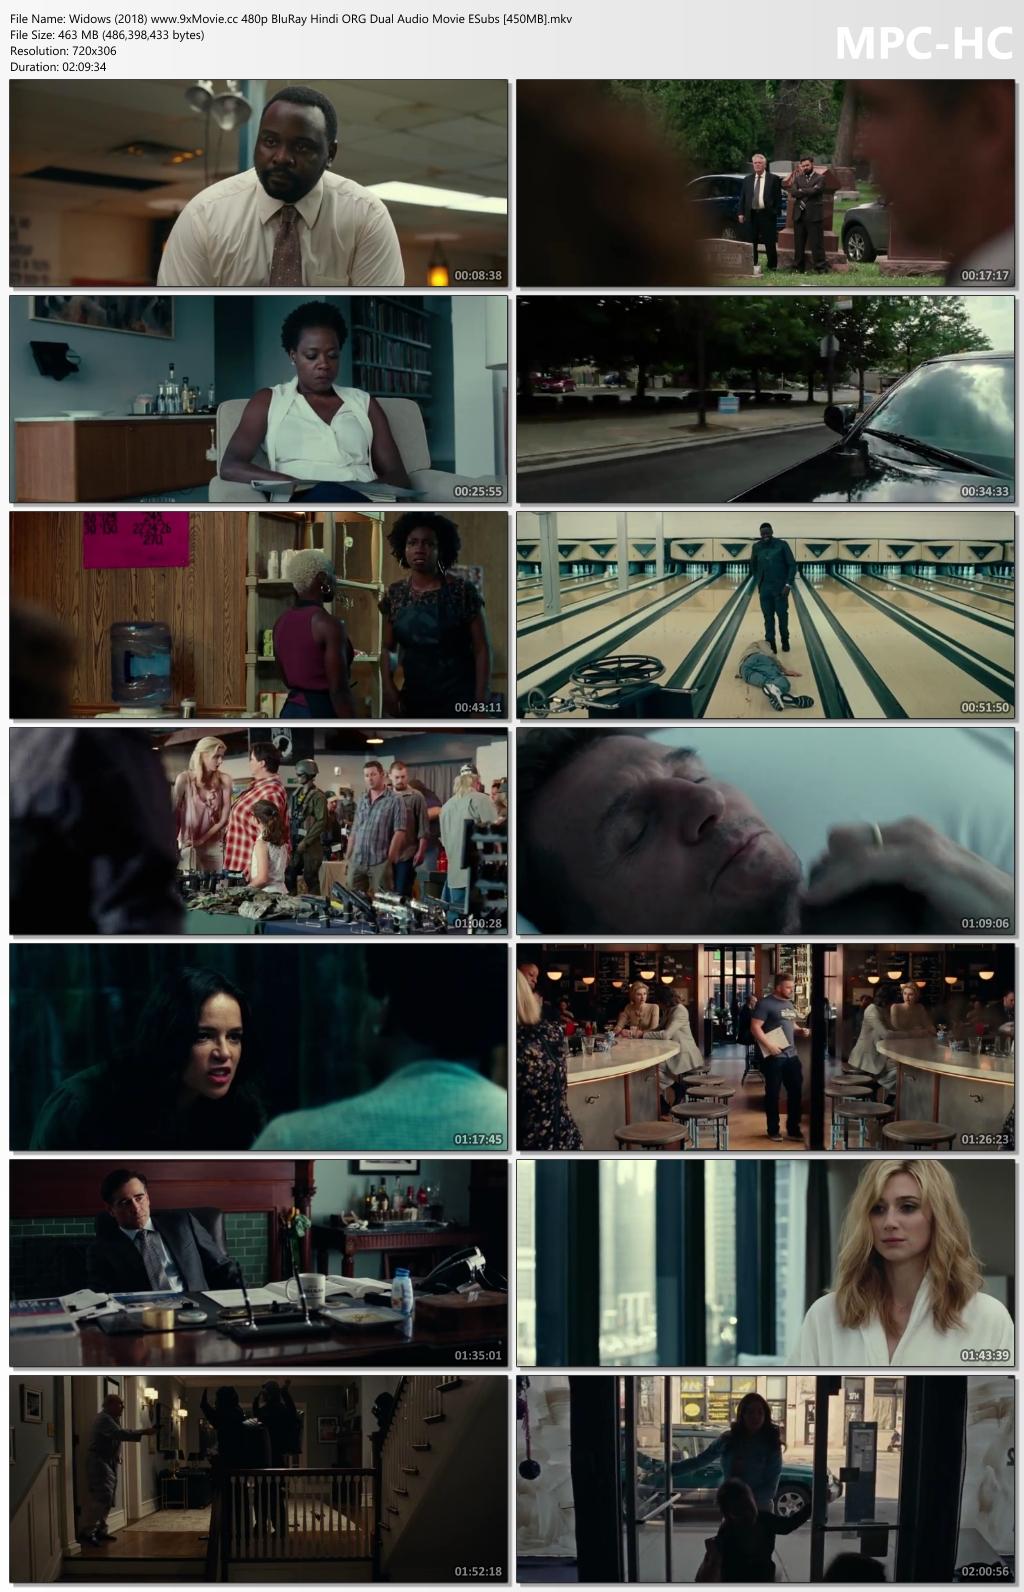 Widows-2018-www-9x-Movie-cc-480p-Blu-Ray-Hindi-ORG-Dual-Audio-Movie-ESubs-450-MB-mkv